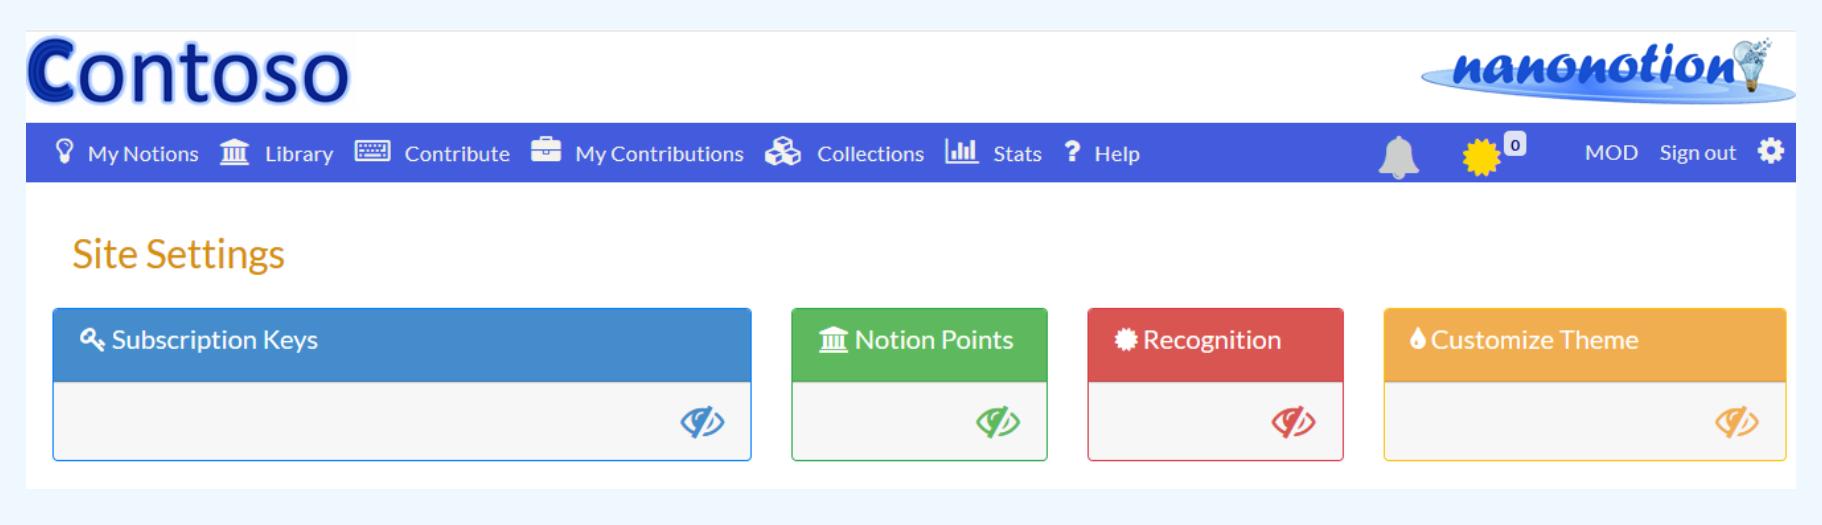 NanoNotion Software - Site settings